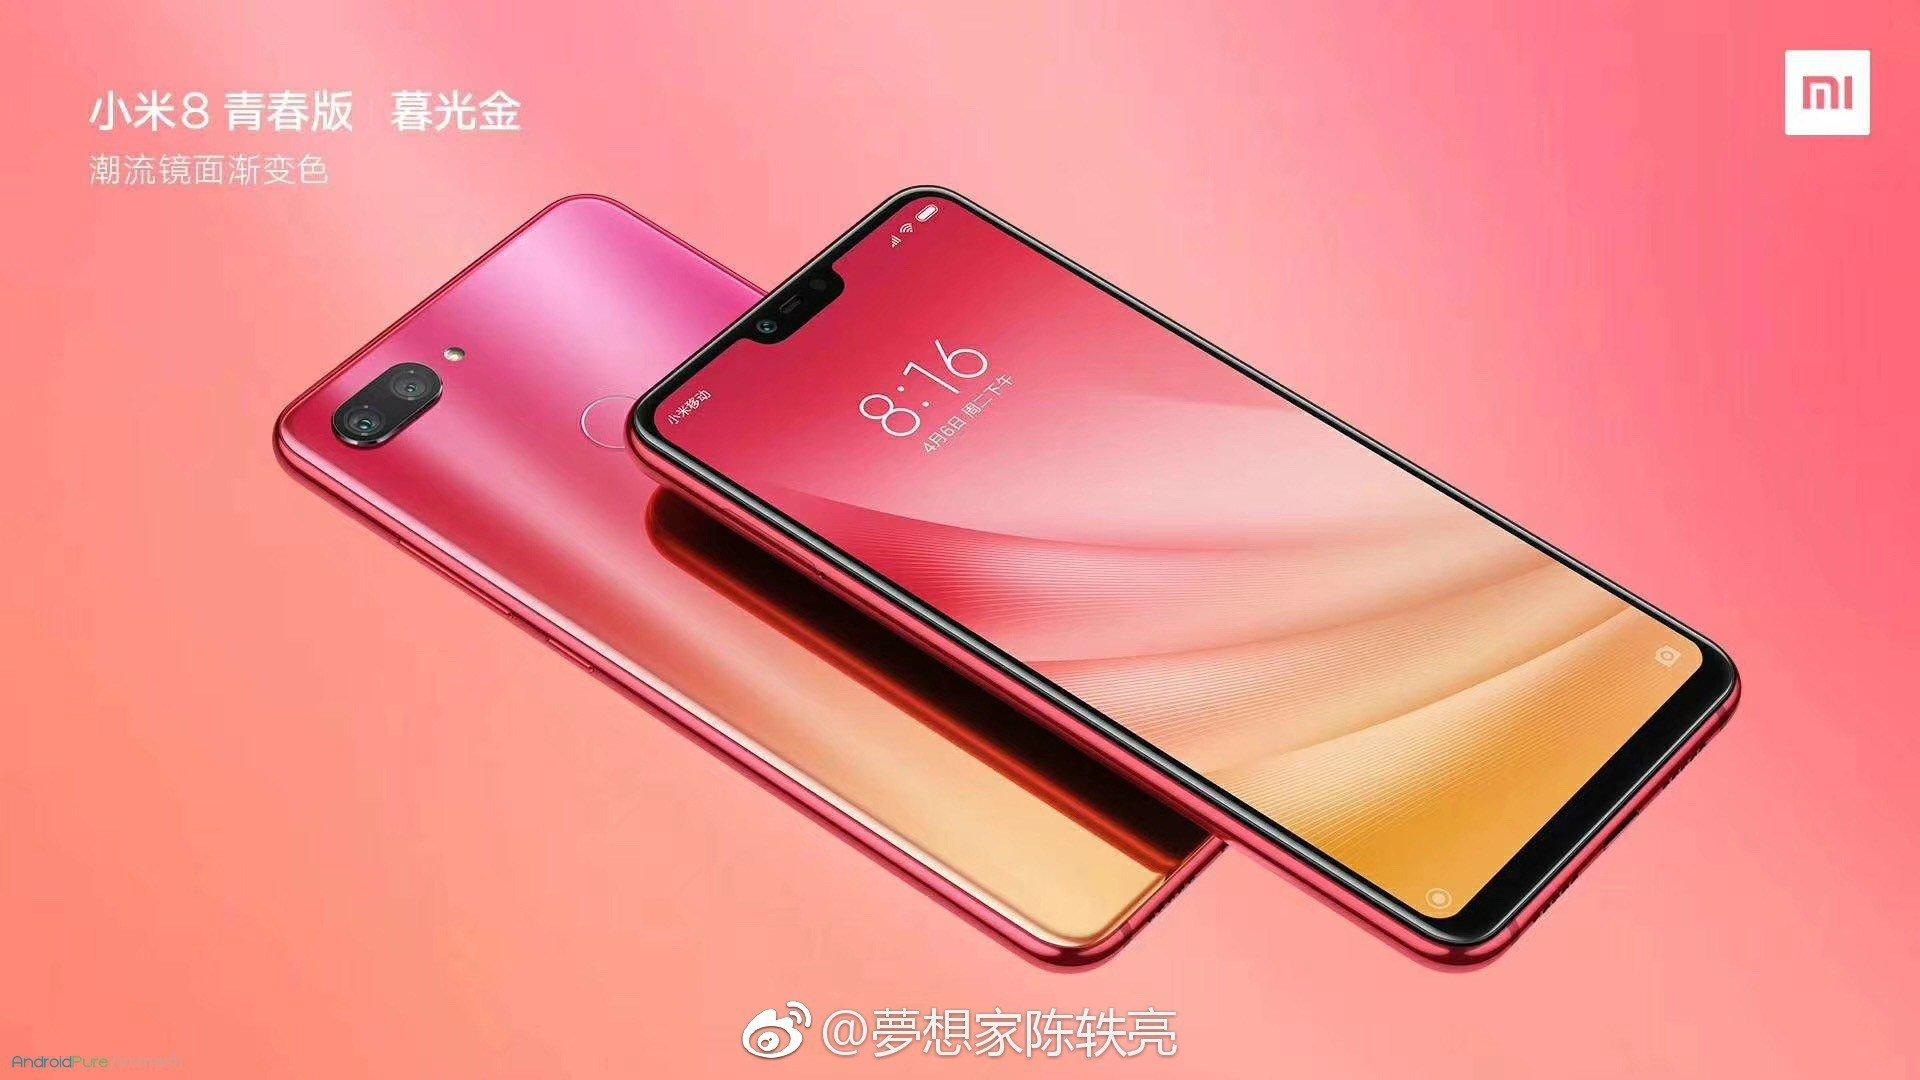 Xiaomi Mi 8 Youth Edition press renders